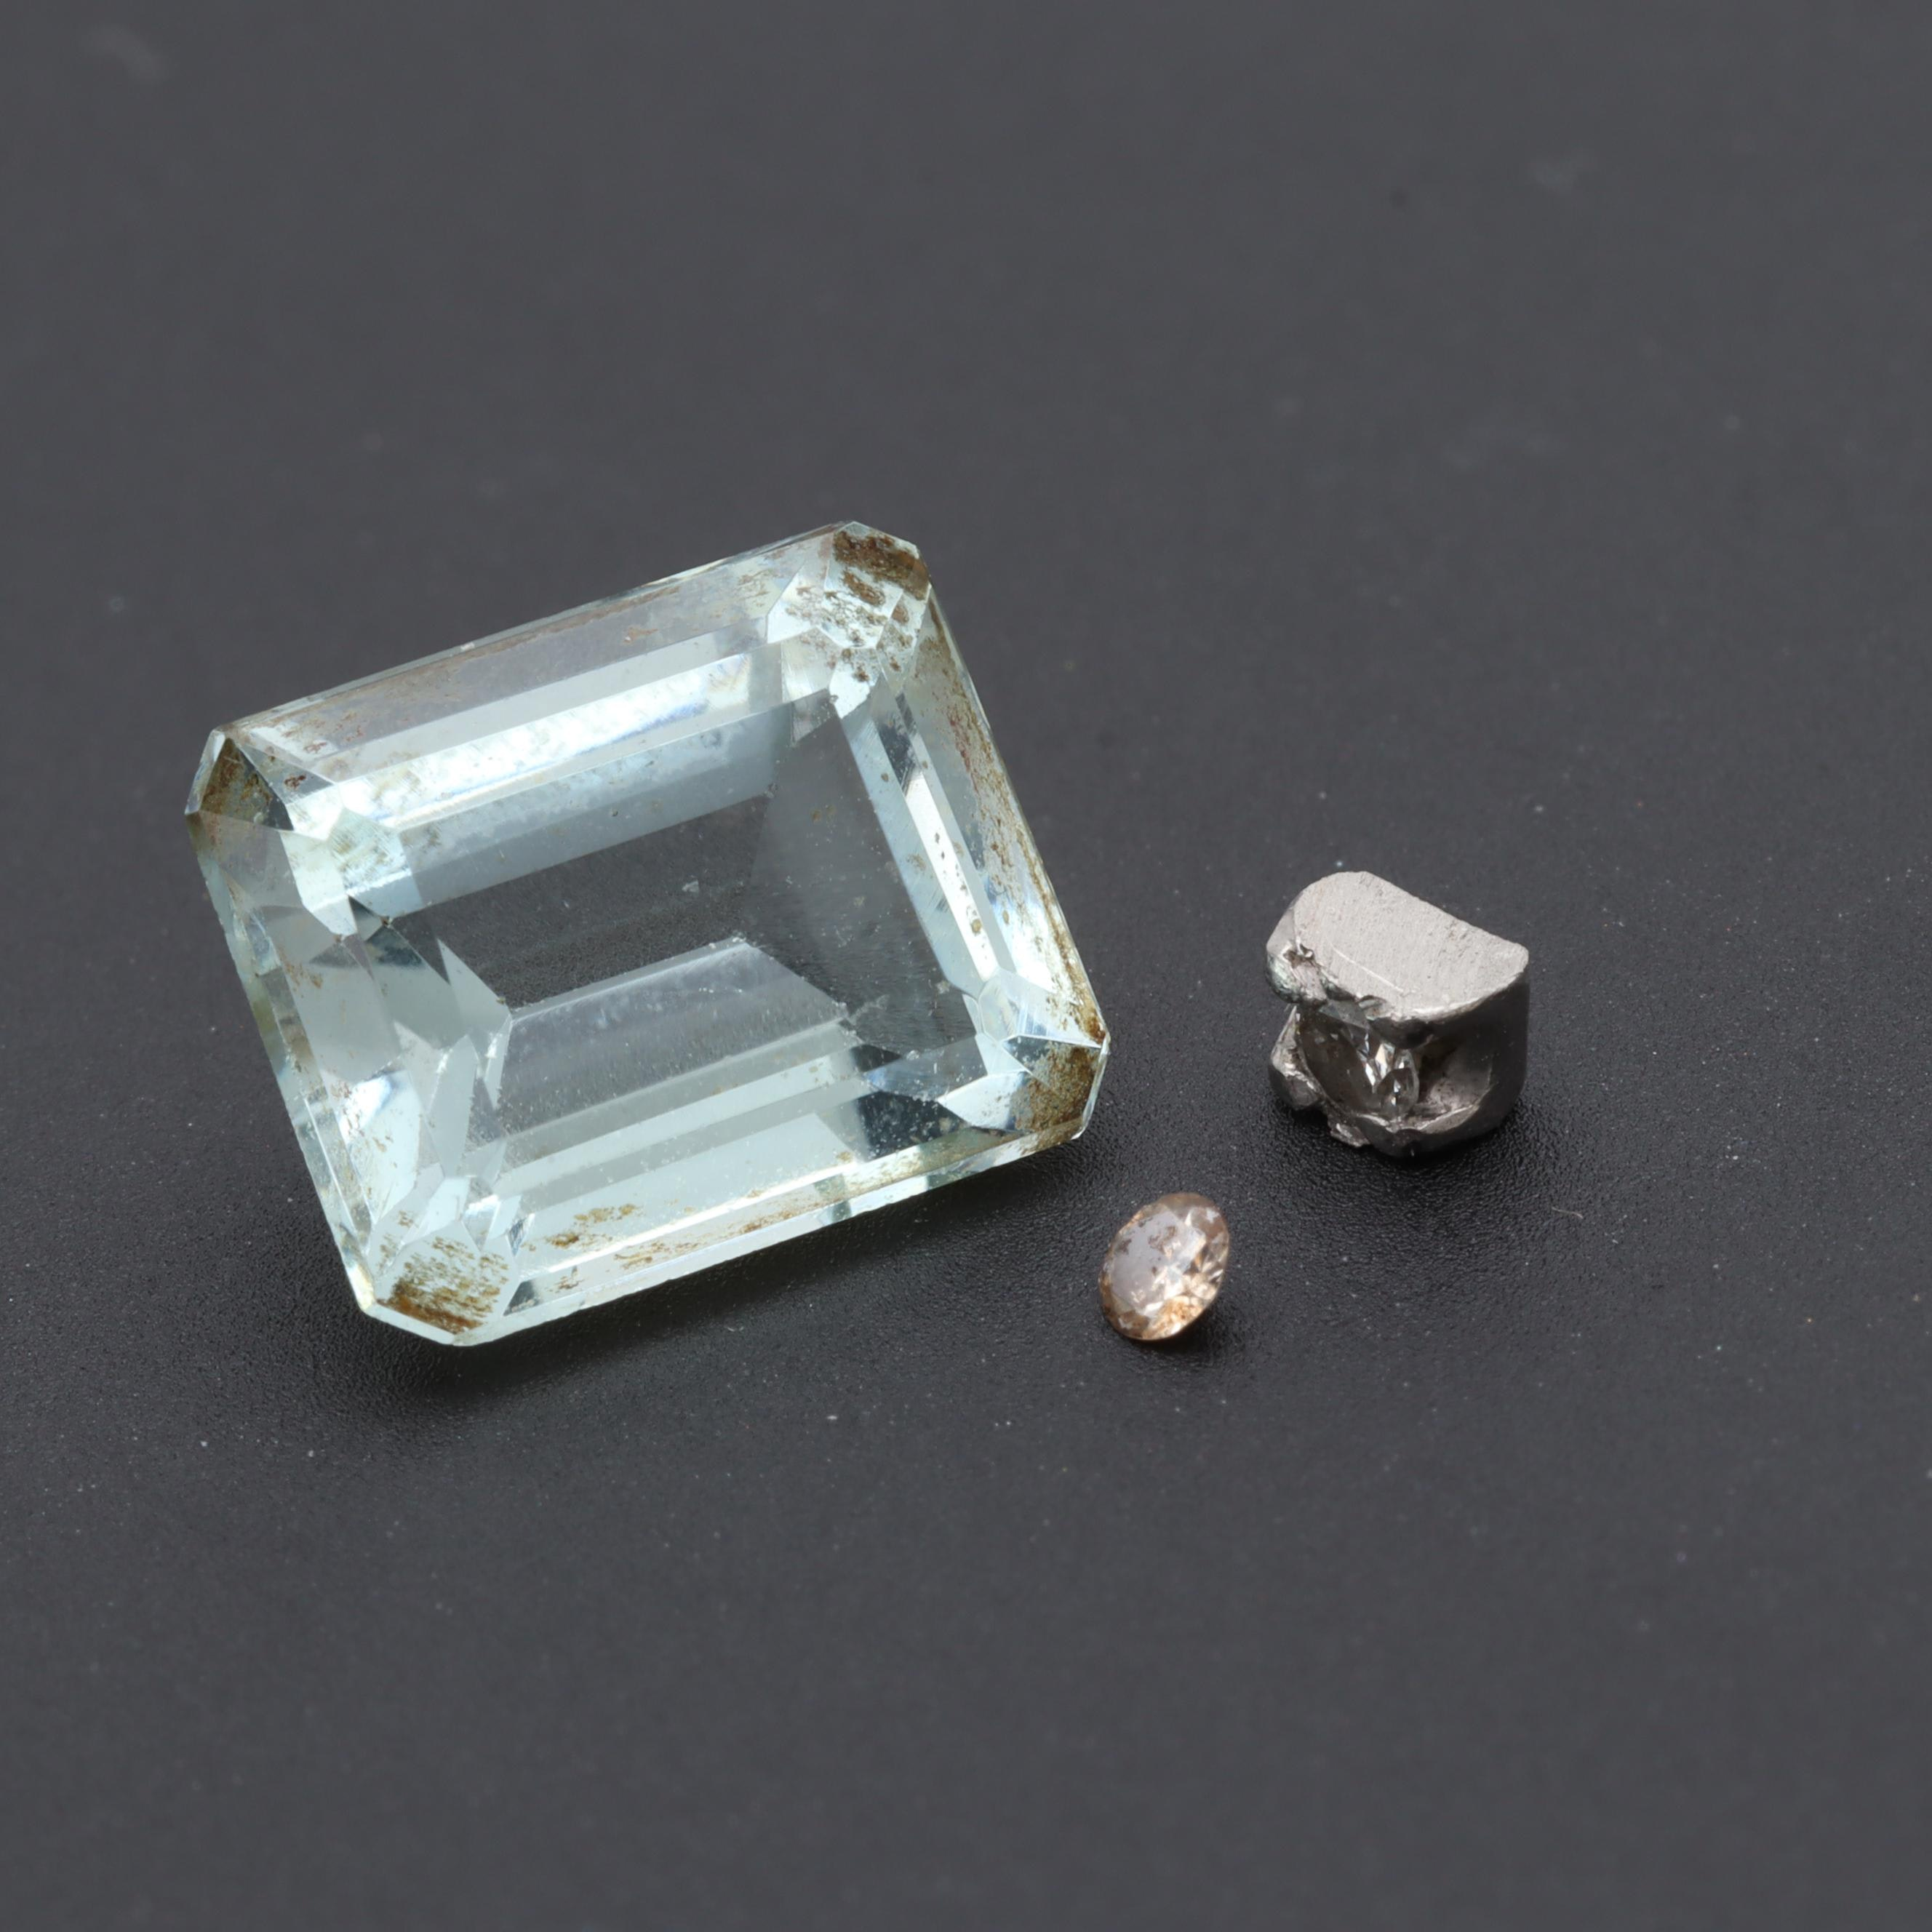 Loose 3.05 CT Aquamarine and 0.05 CTW Diamond Selection